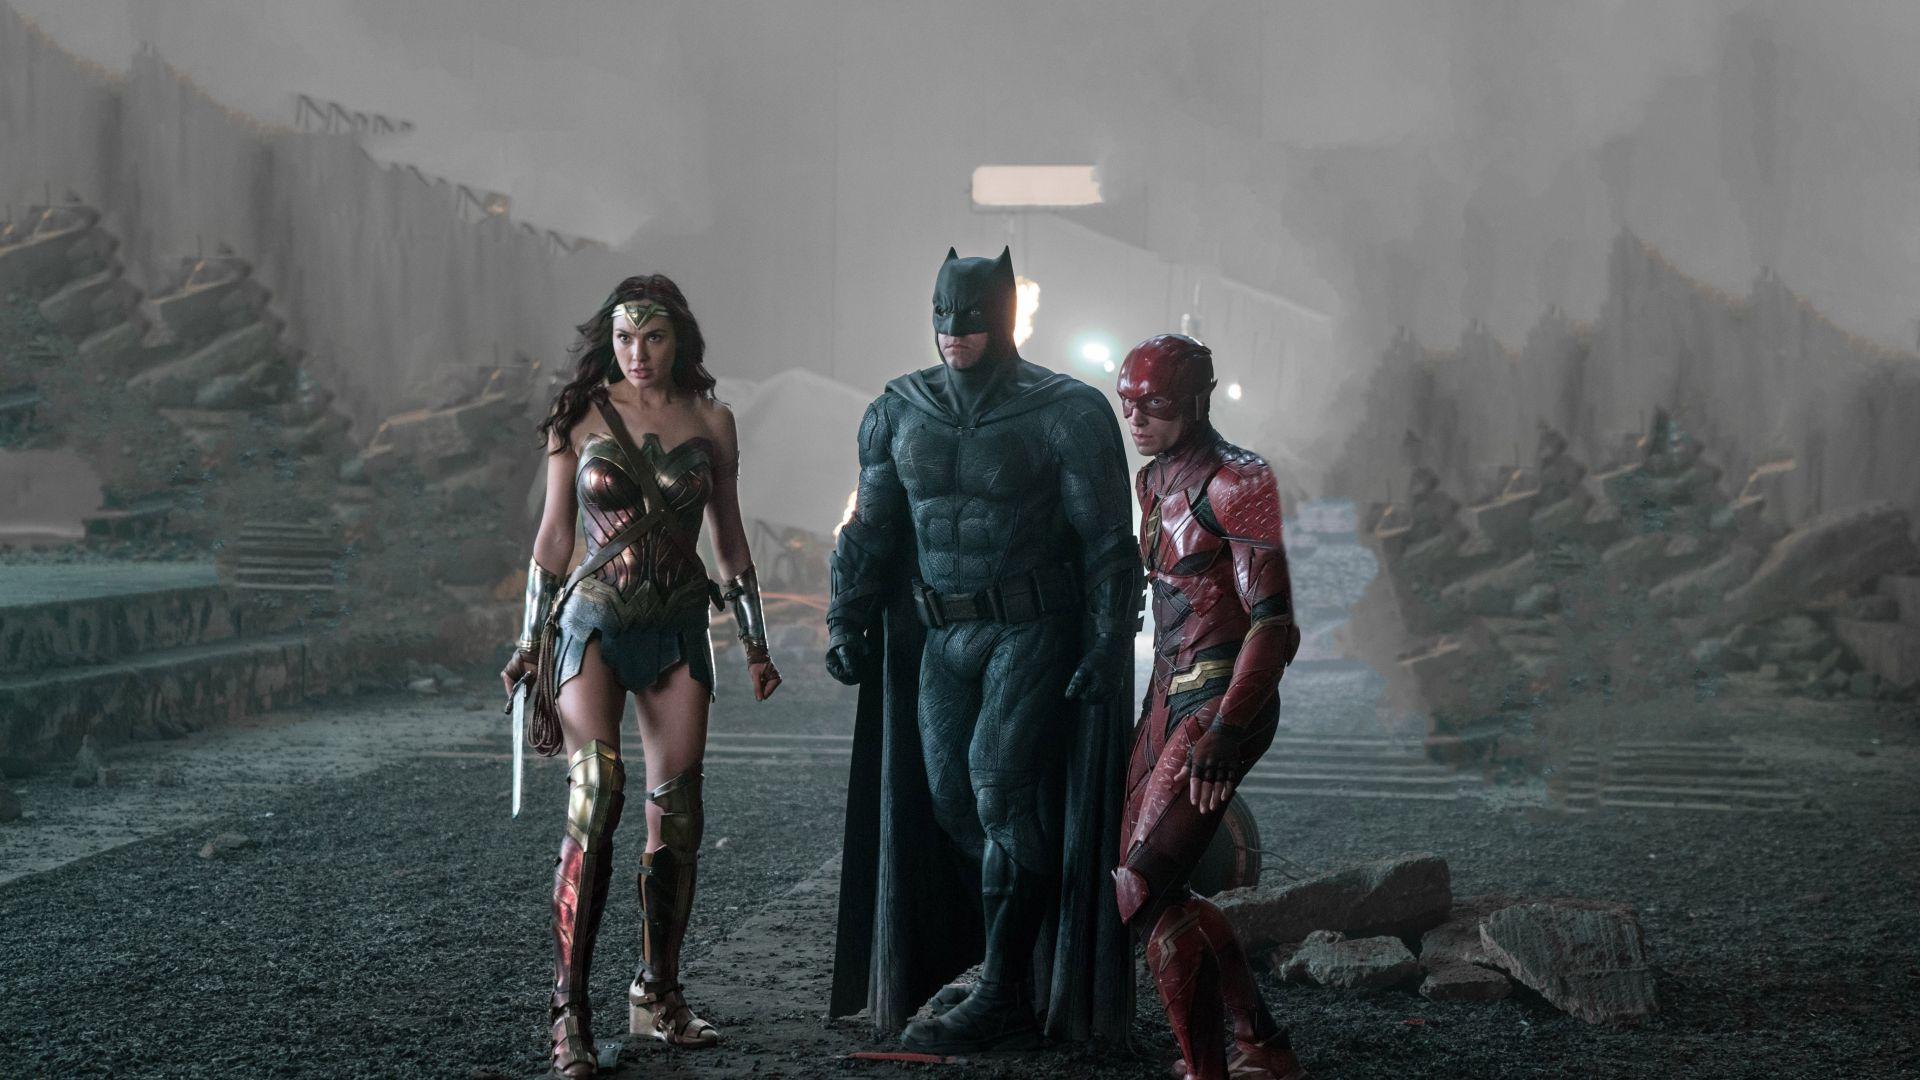 Wallpaper Justice league, 2017 movie, wonder woman, batman, flash